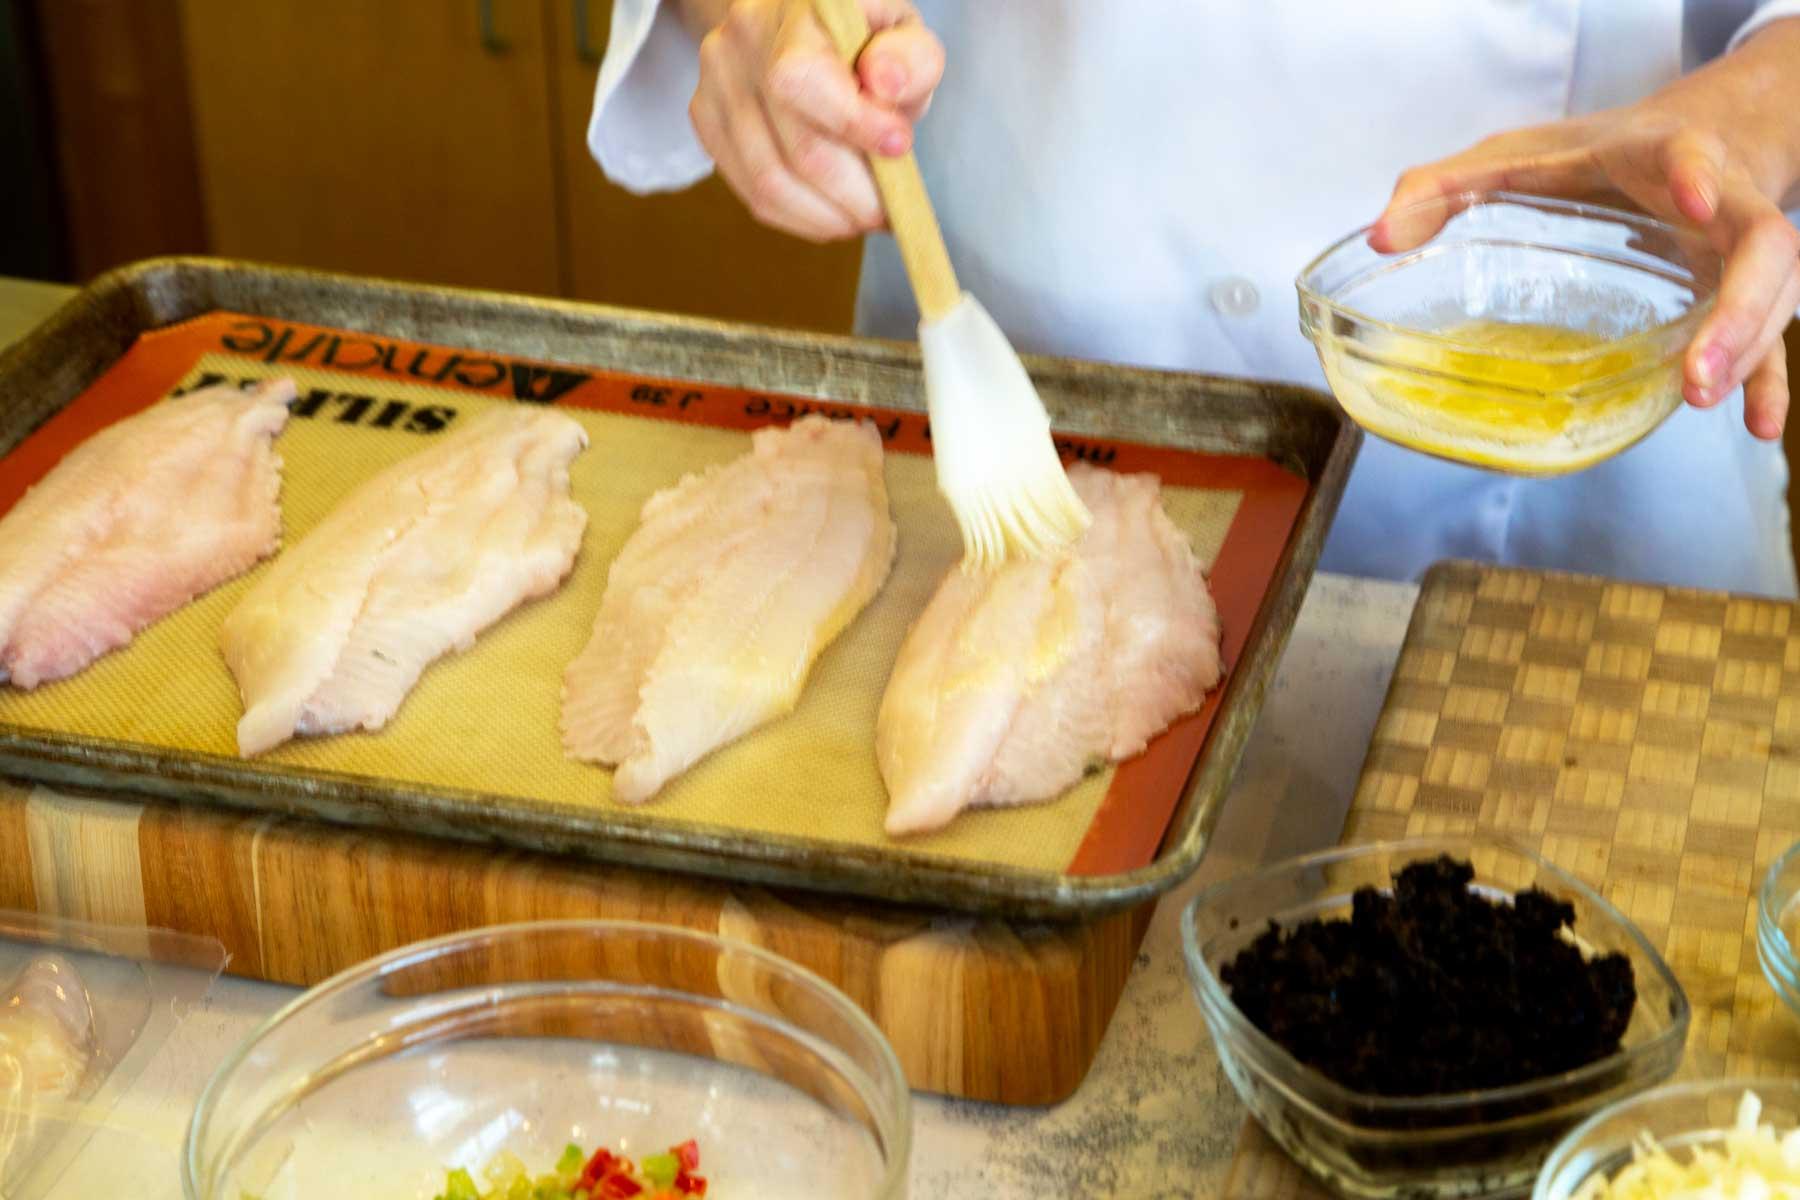 Brushing butter onto catfish fillets on baking sheet